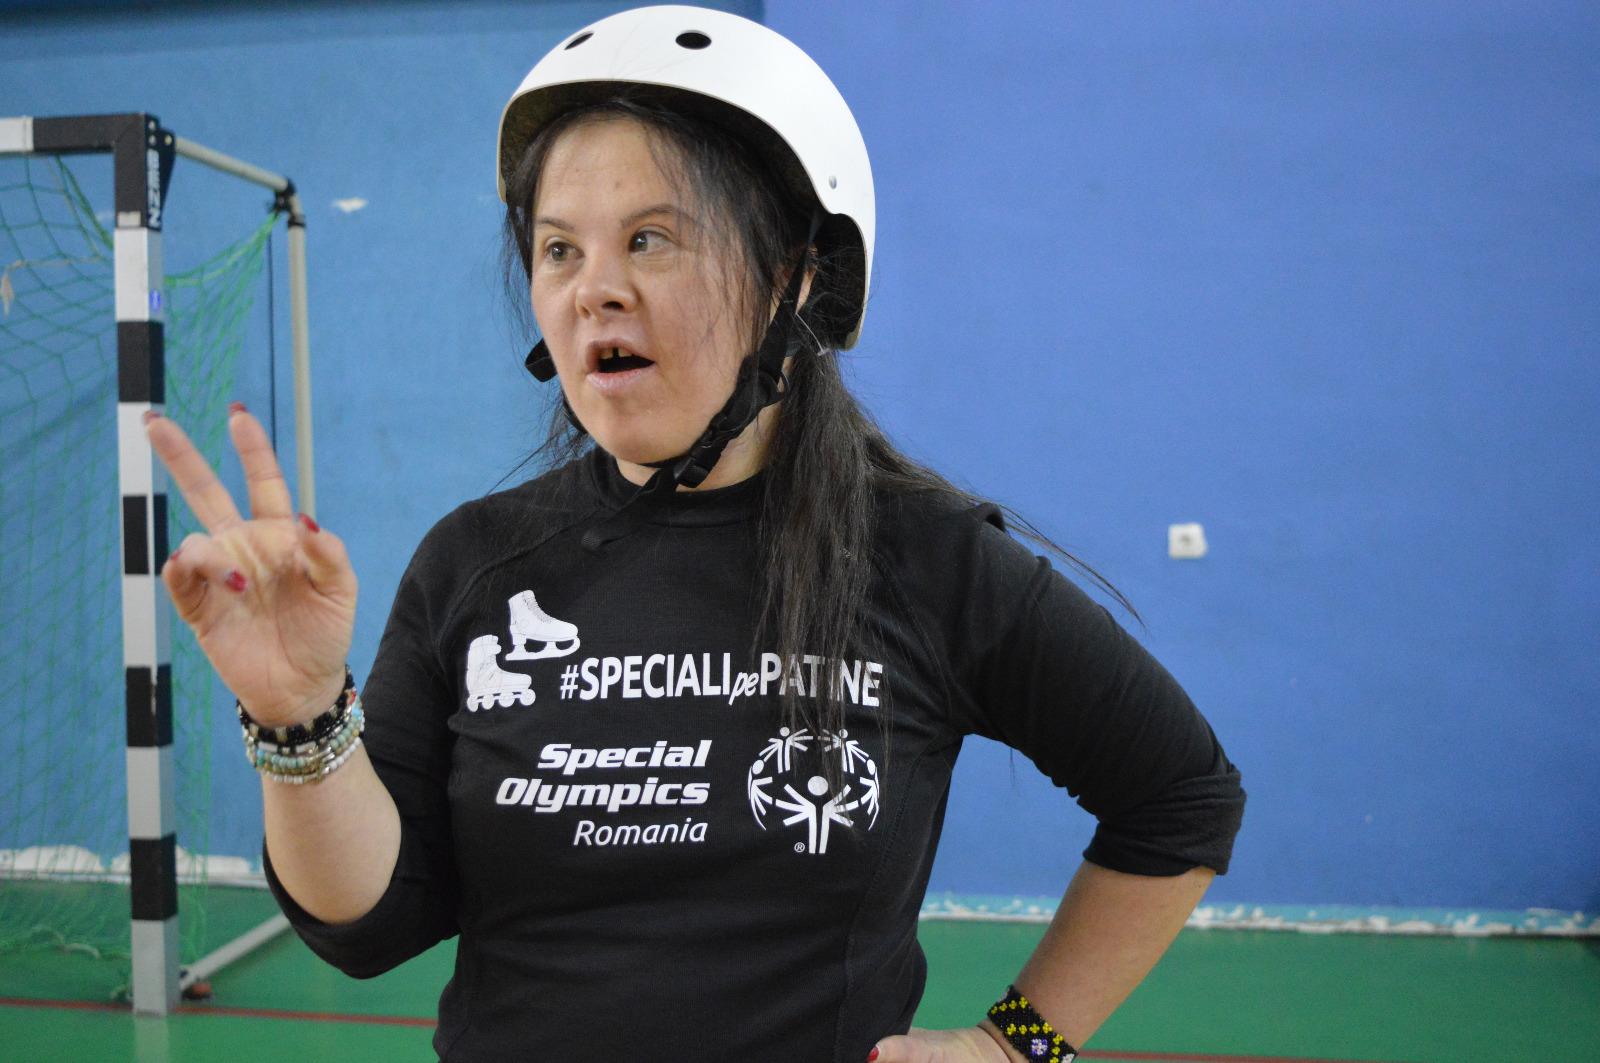 Special Olympics Romania, Speciali pe Patine, Cluj-Napoca (1) – Copy